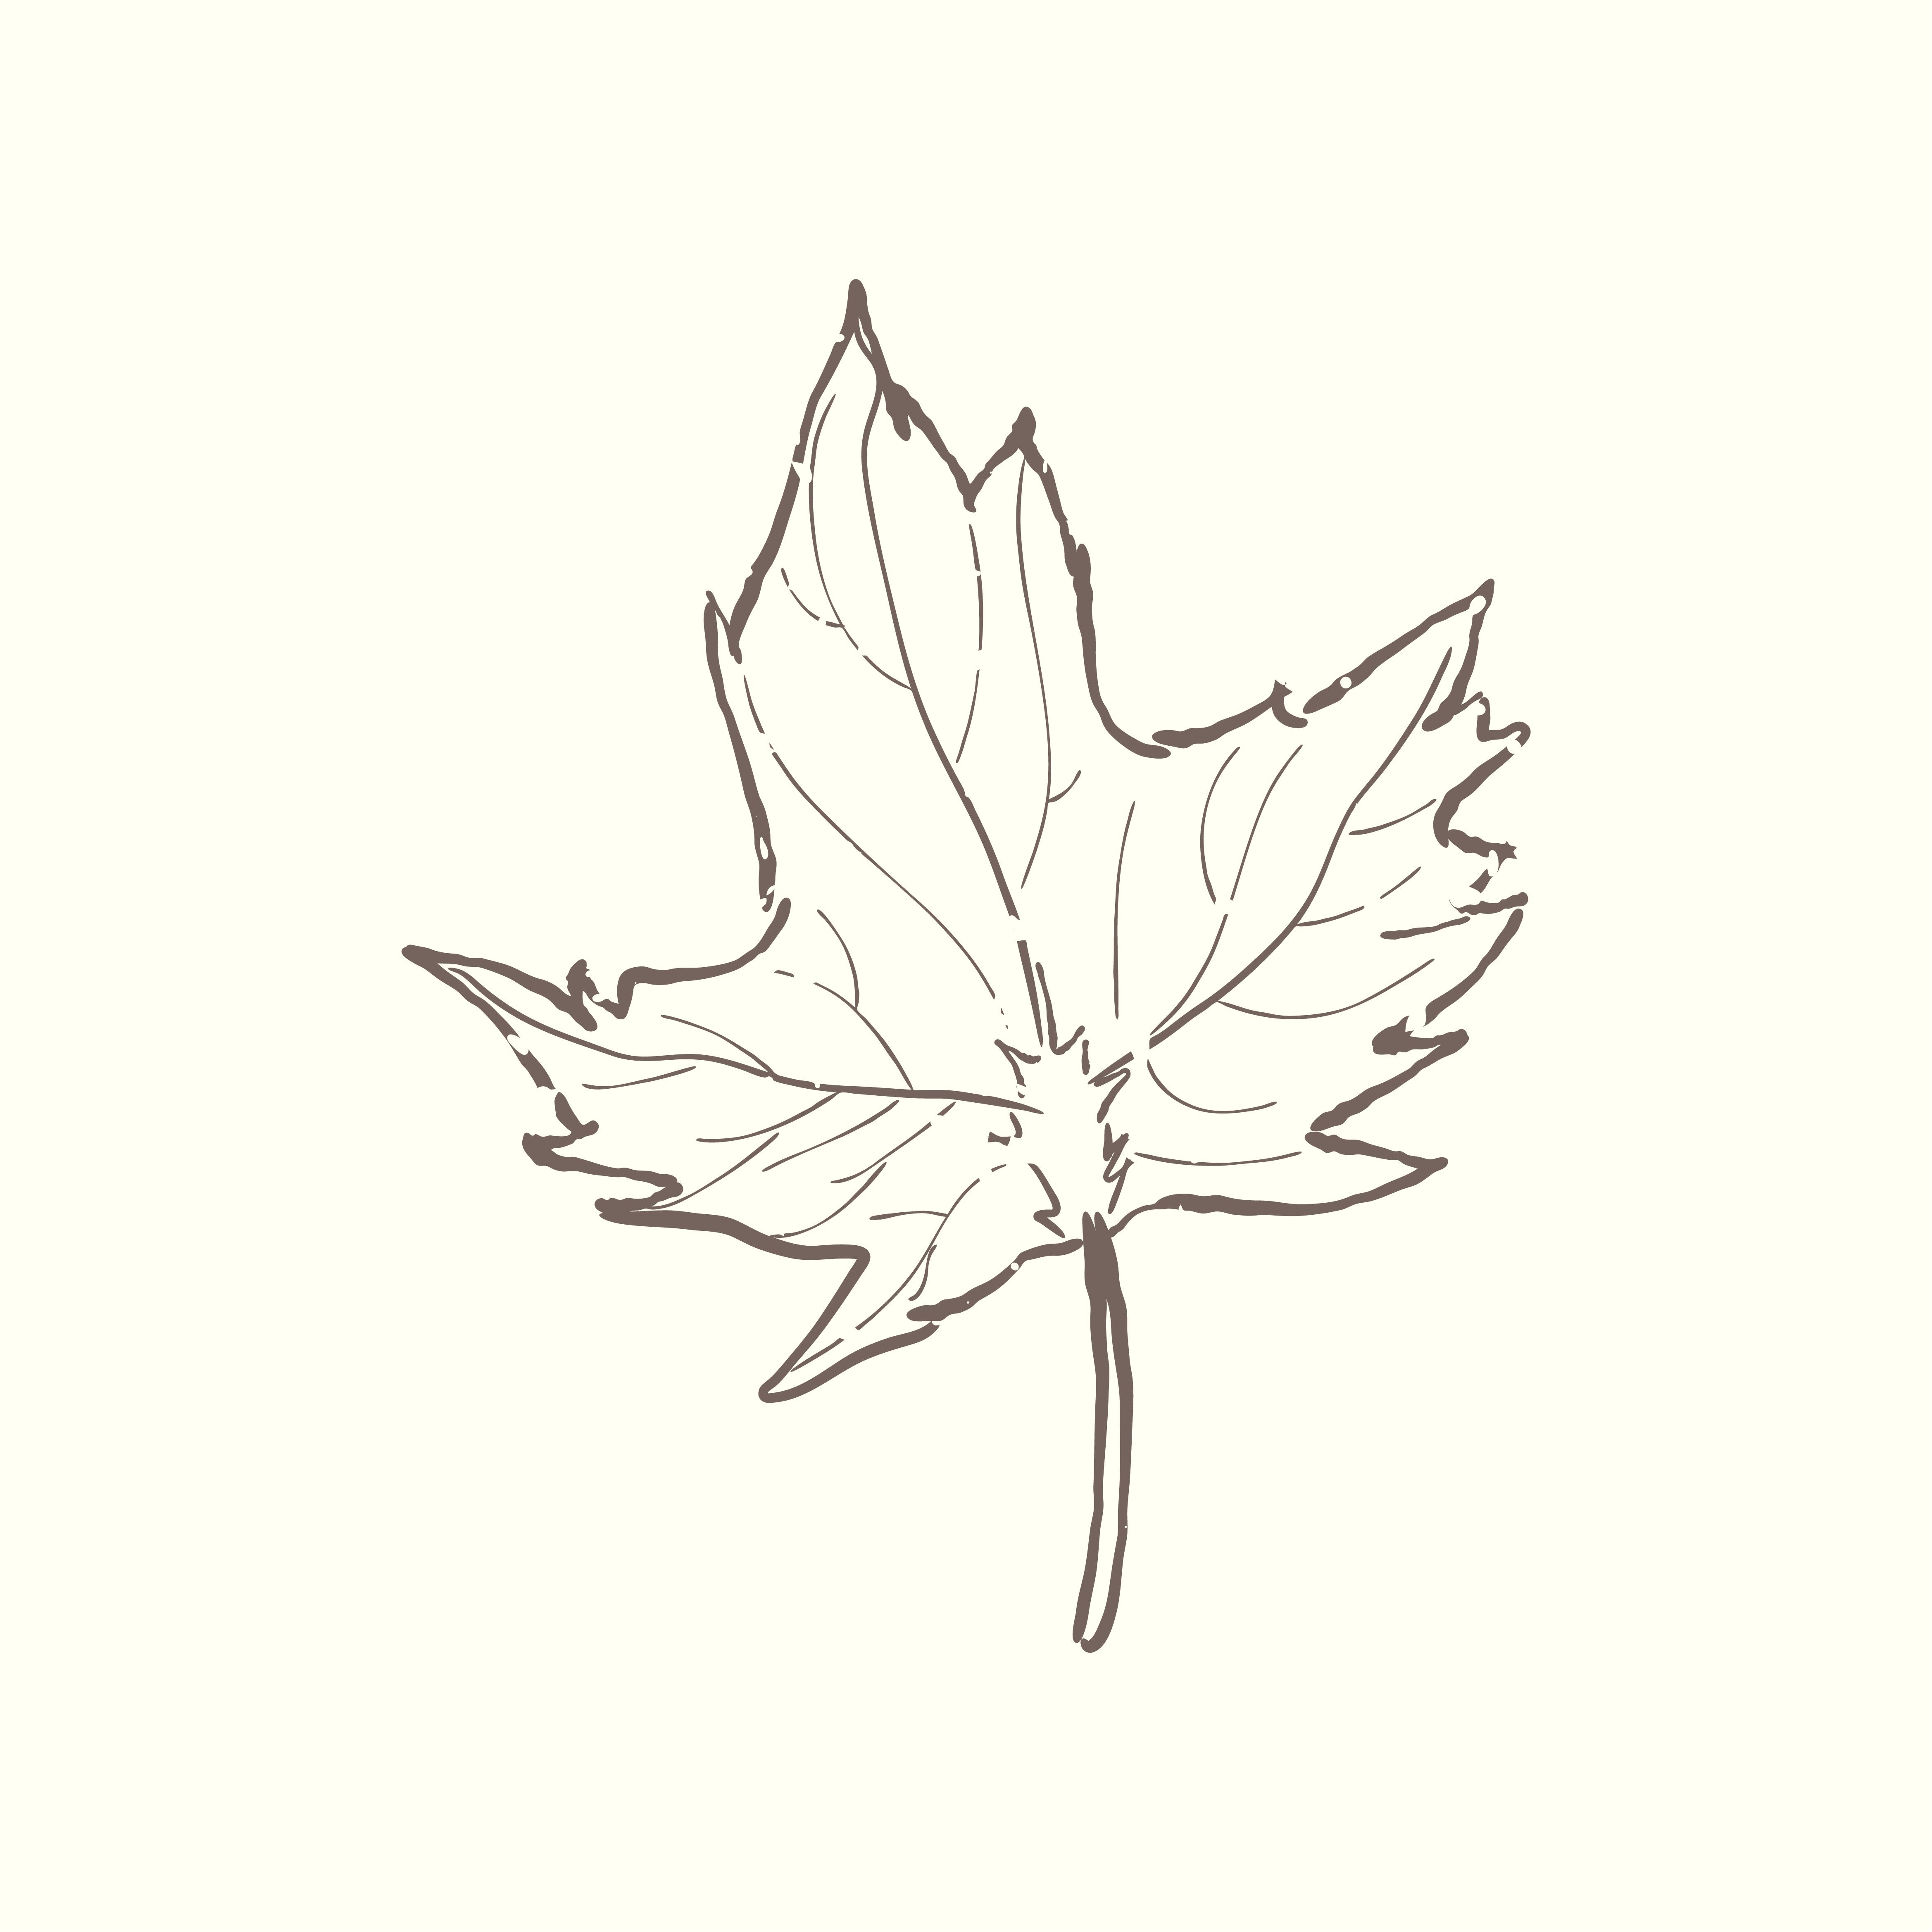 leaf sketch free vector art